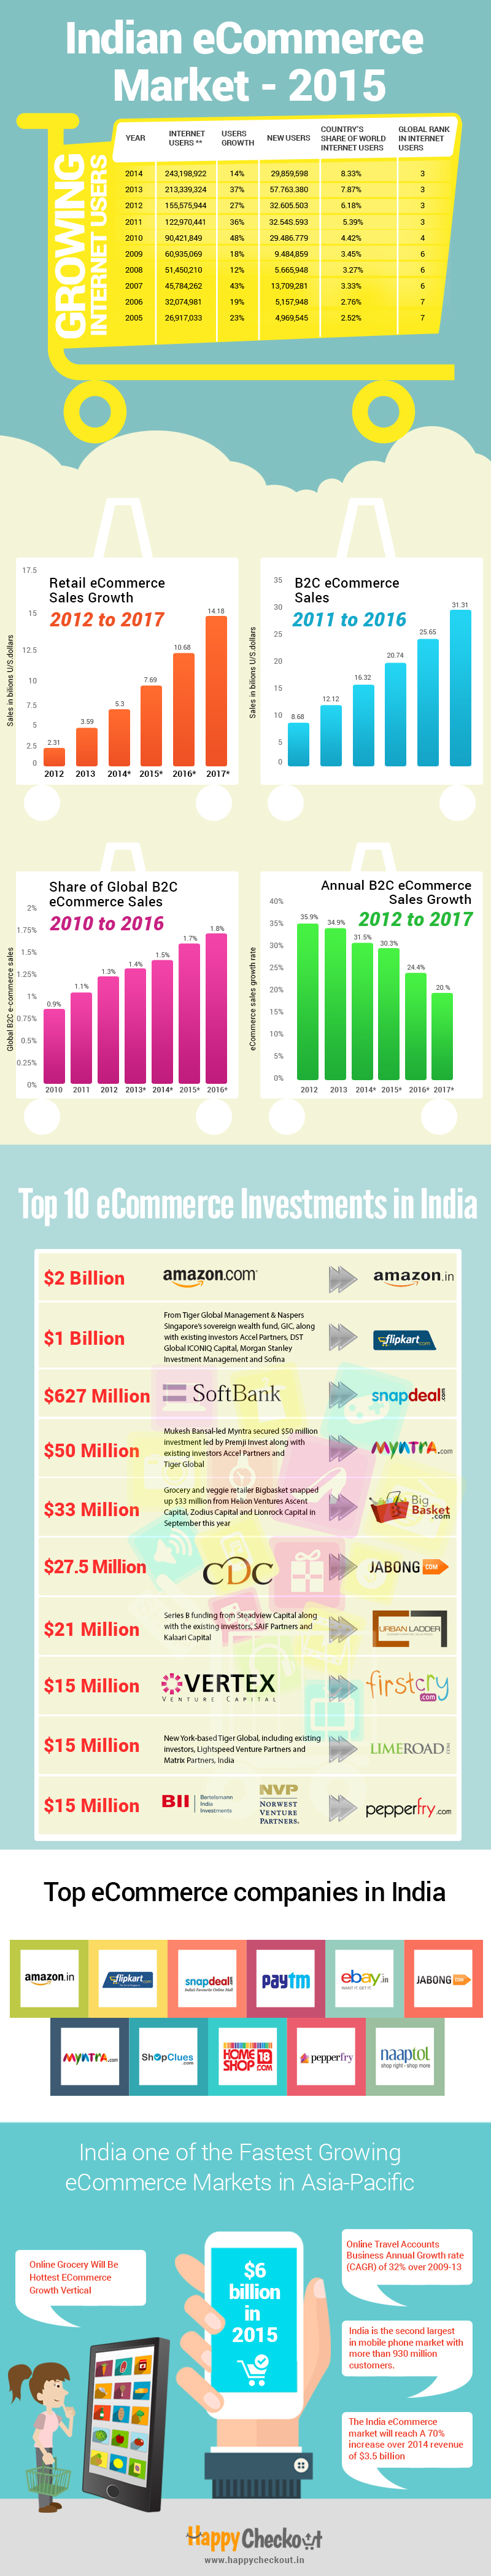 xIndian-eCommerce-Market-2015